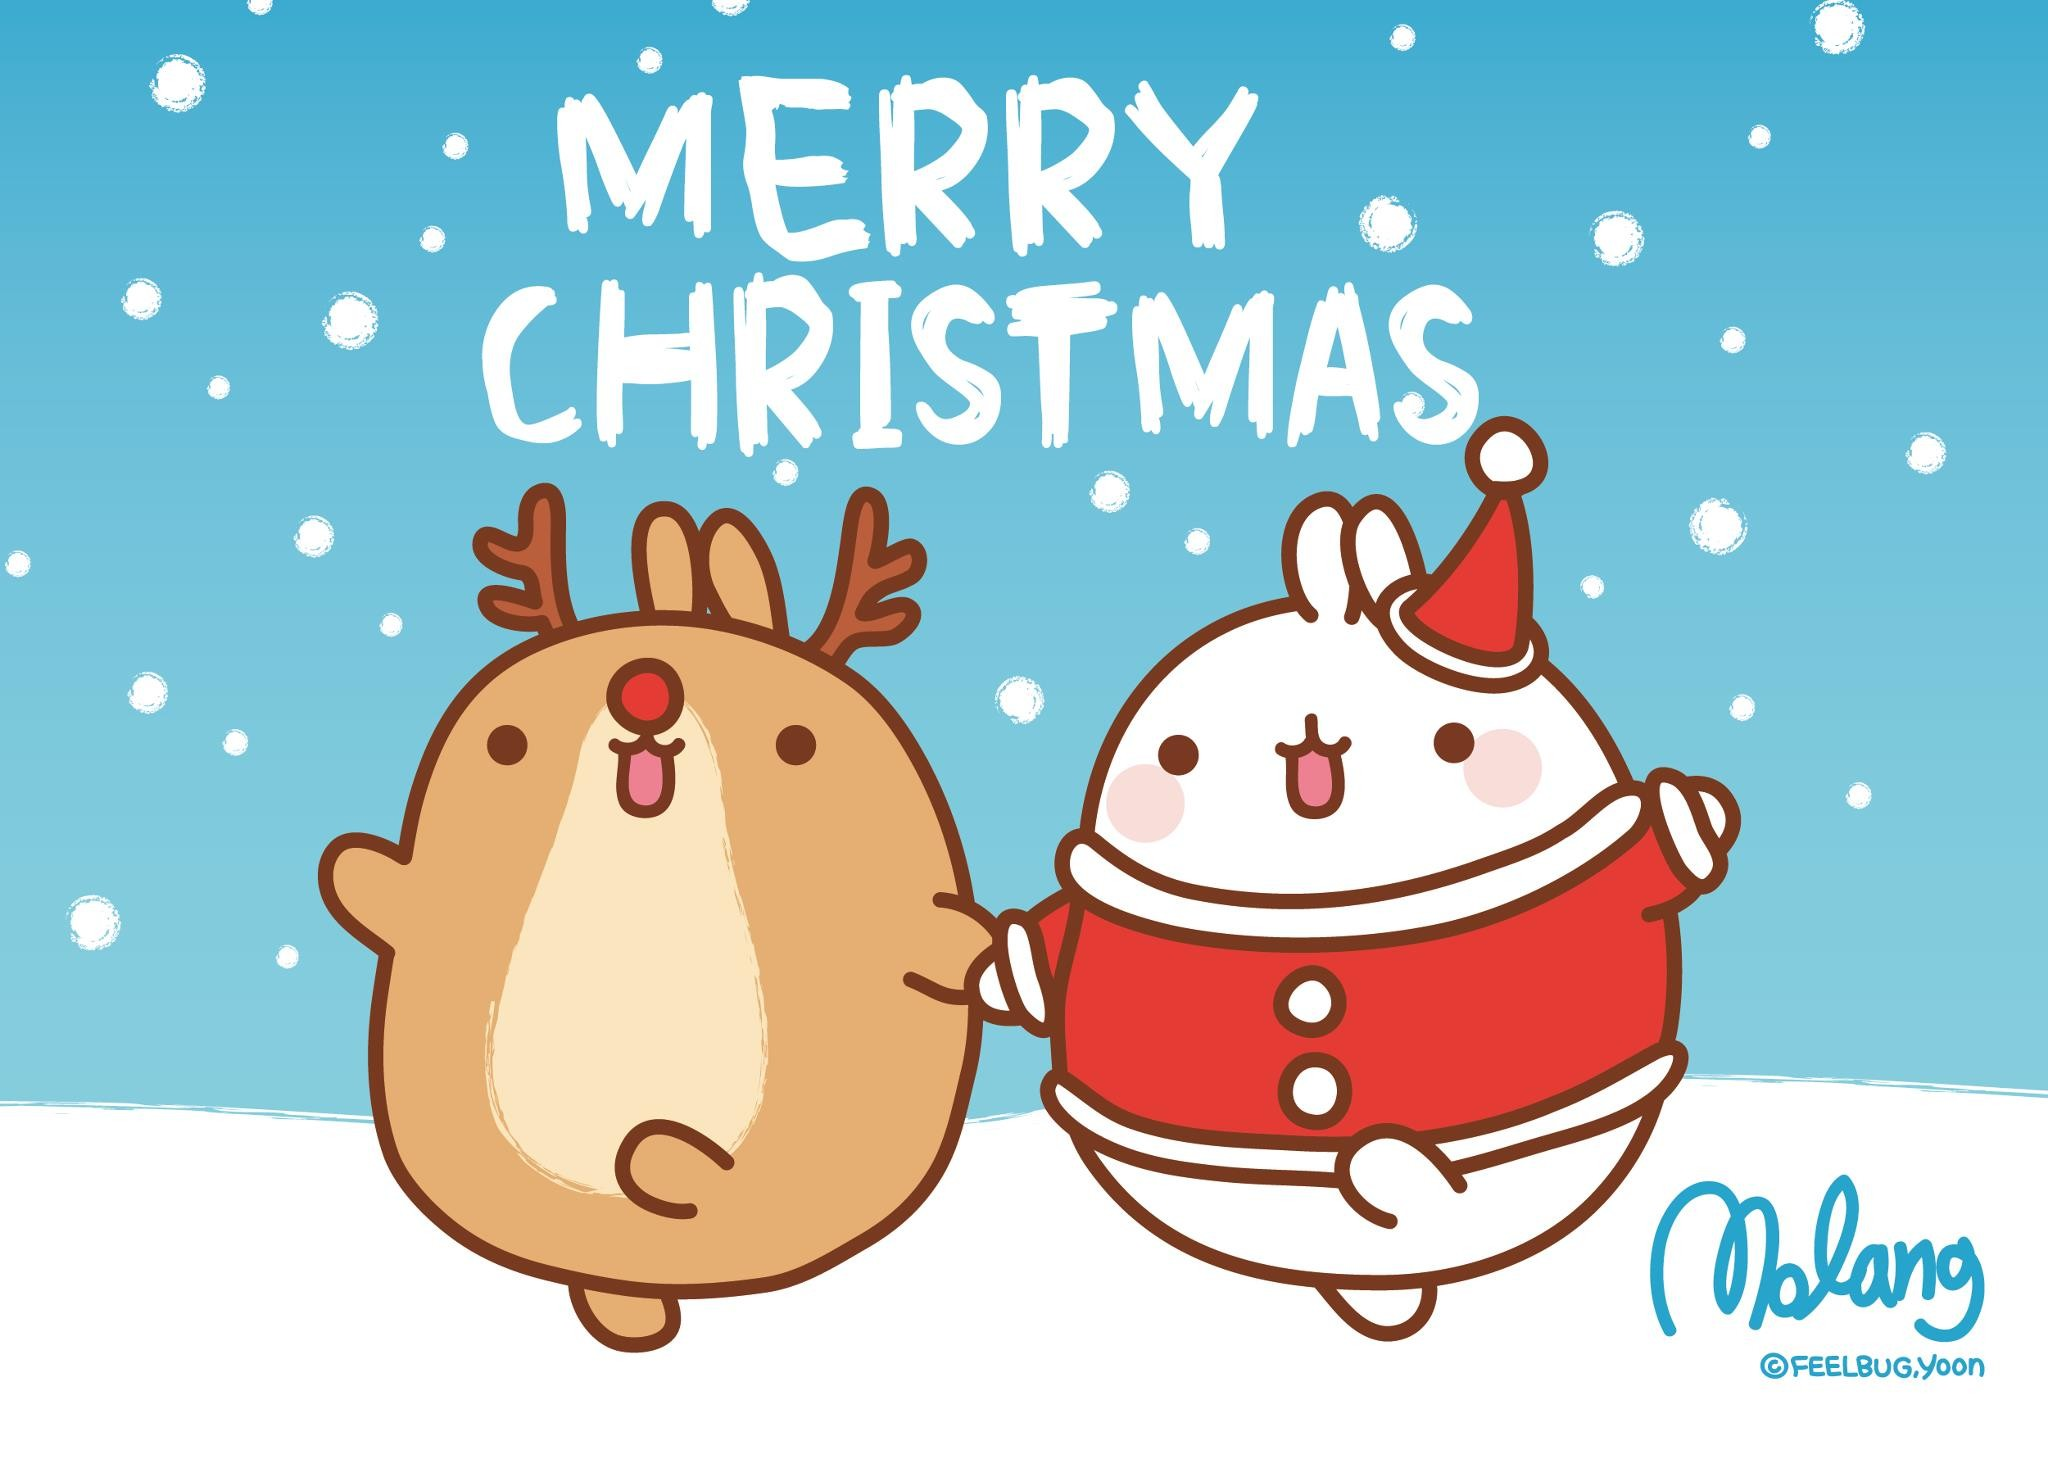 San-X Molang Christmas Desktop Wallpapers – Here are 3 super cute Molang  Desktop Backgrounds